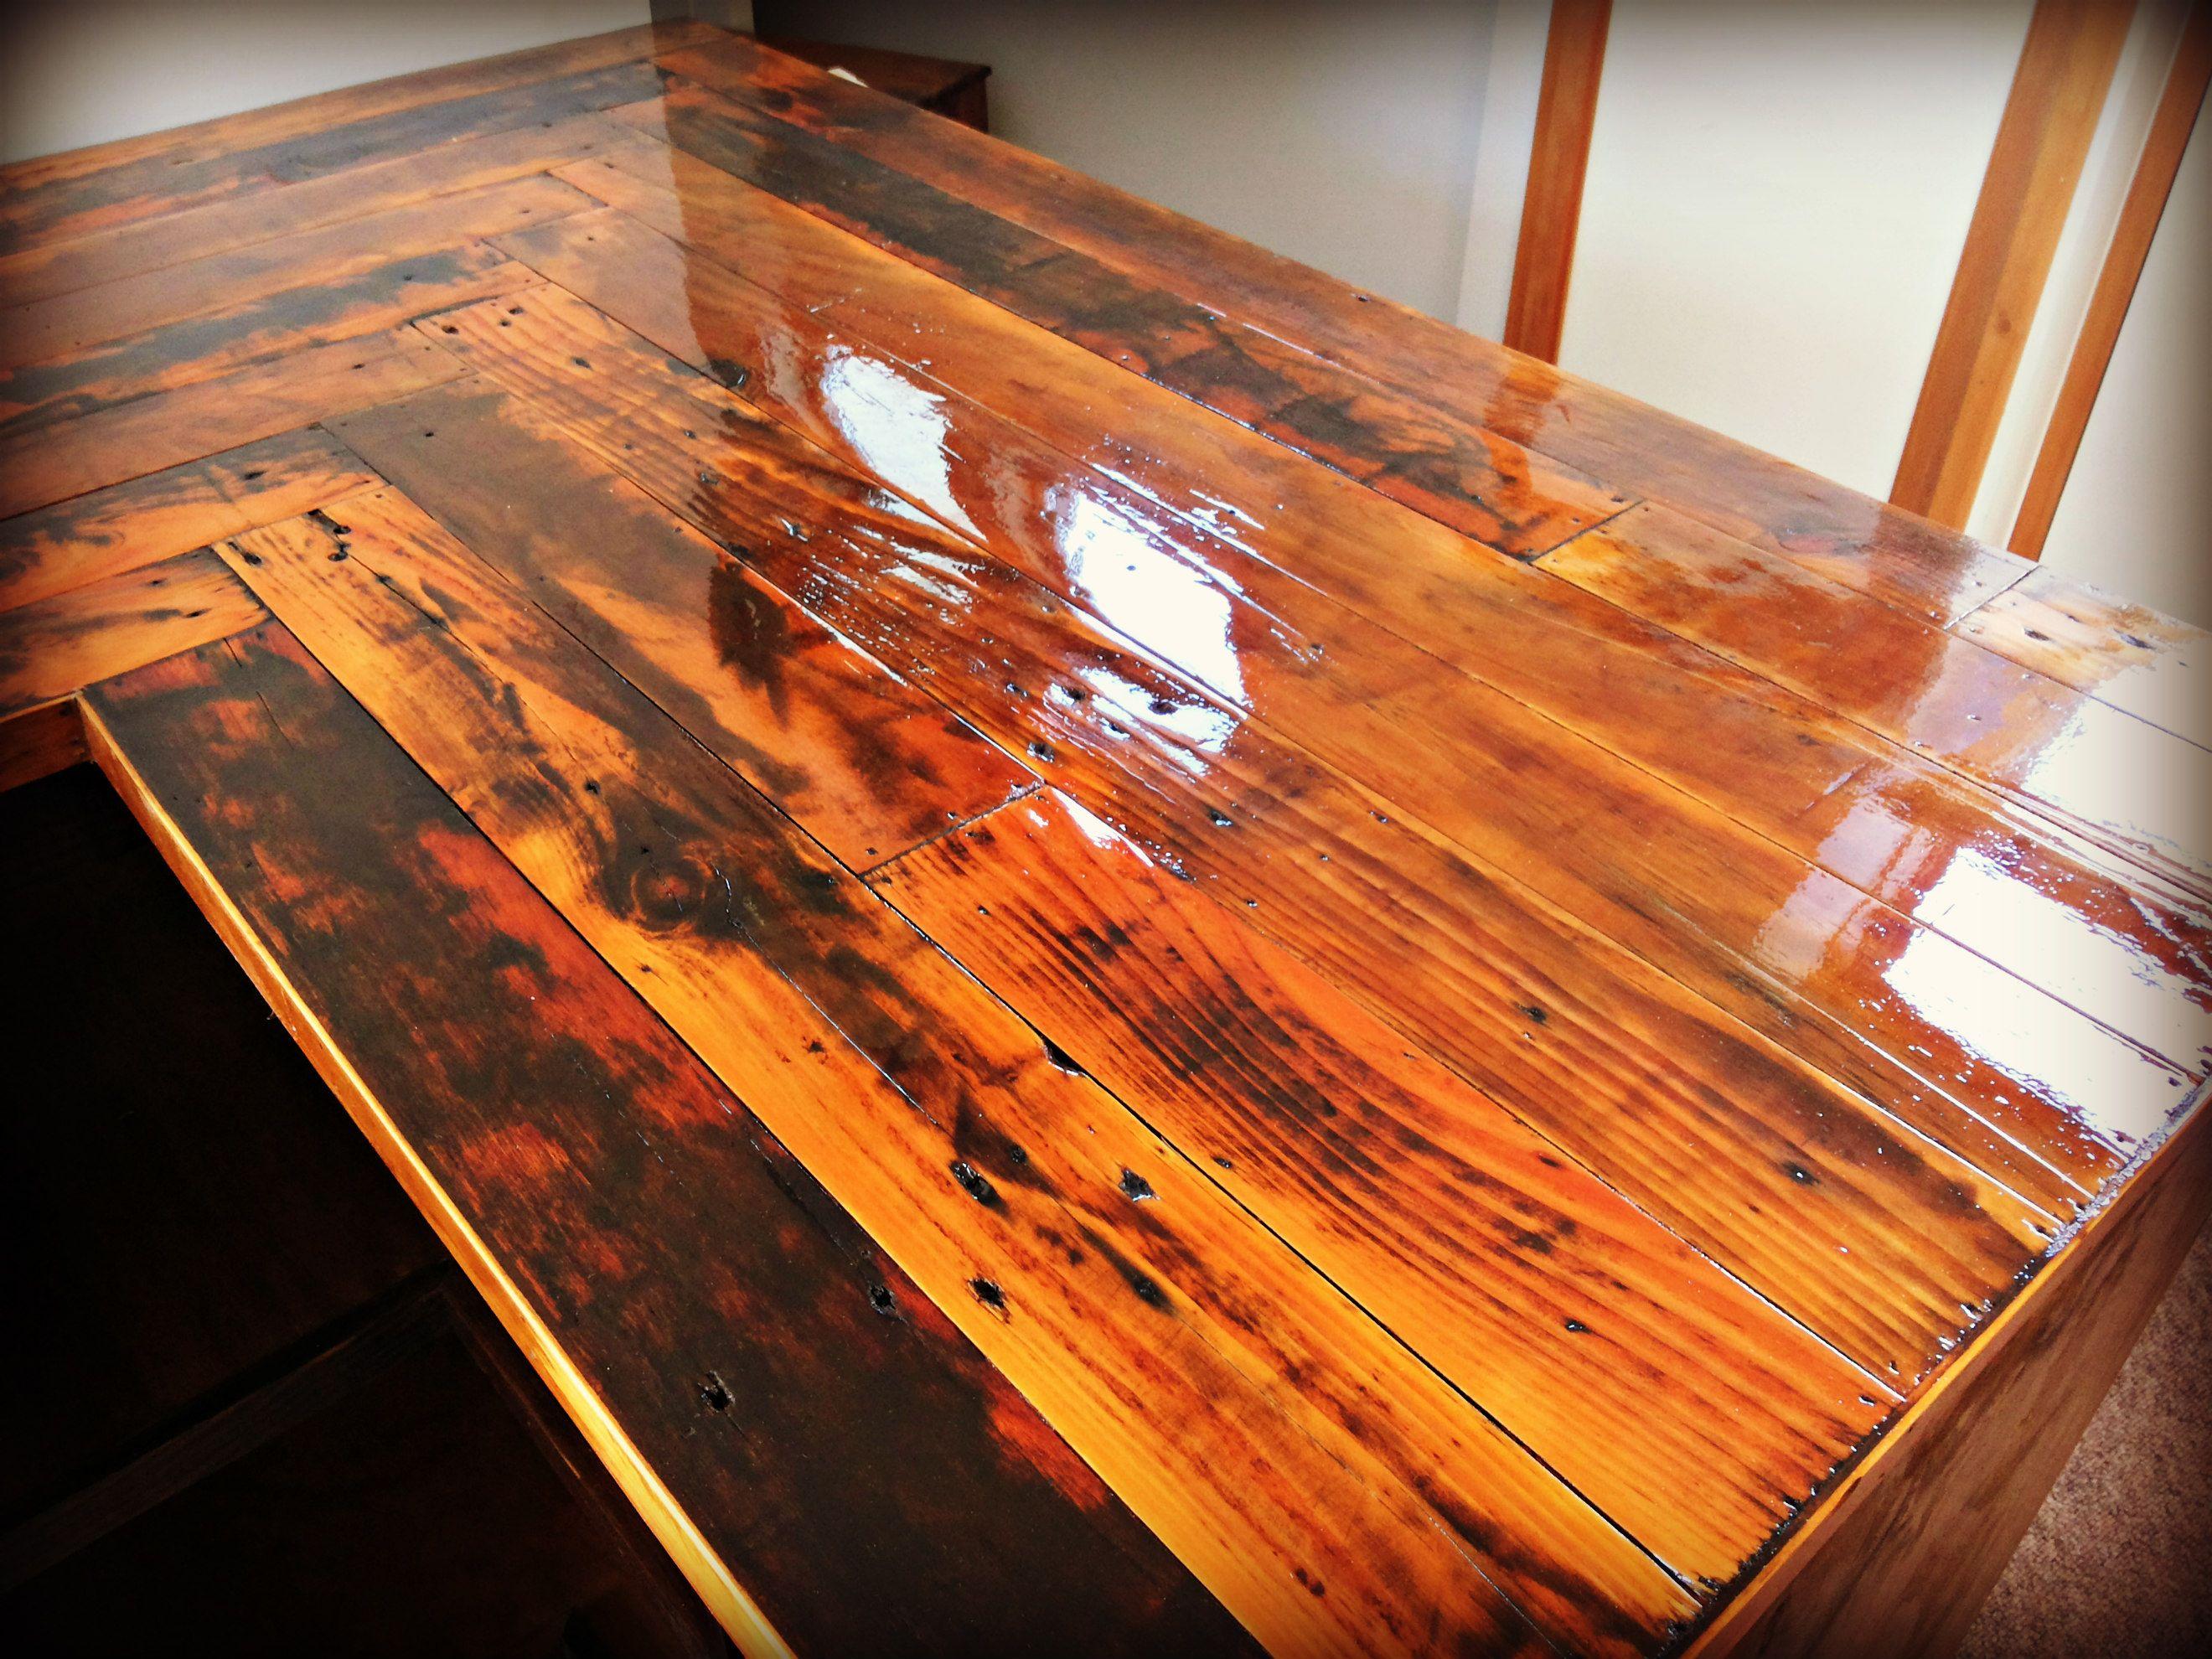 pallet countertop wooden kitchen countertops Kitchen Countertop made with reclaimed pallet wood cabinets